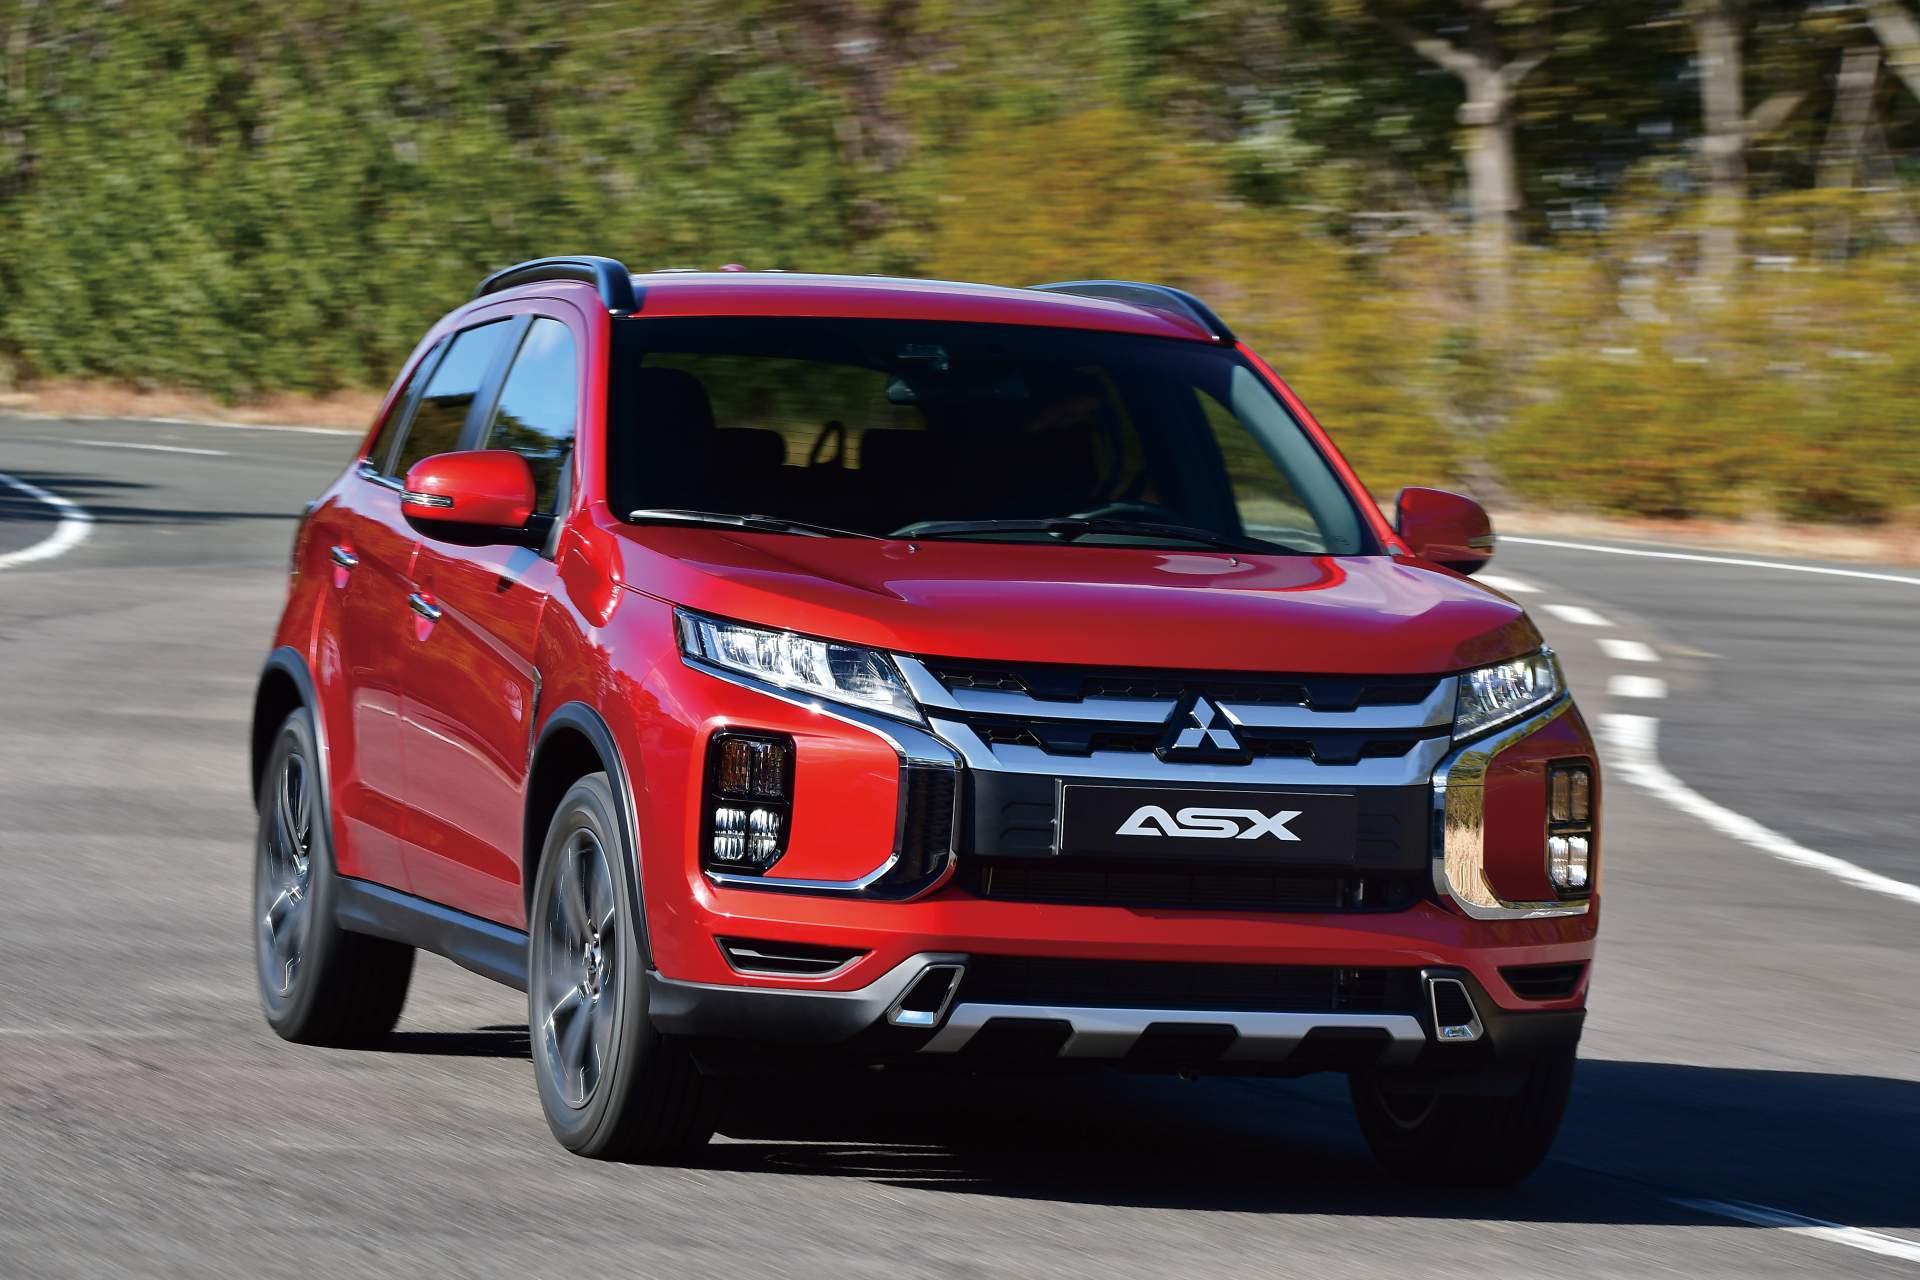 2020 Mitsubishi ASX 4 - أسعار سيارات ميتسوبيشي إي إس إكس في الكويت 2022